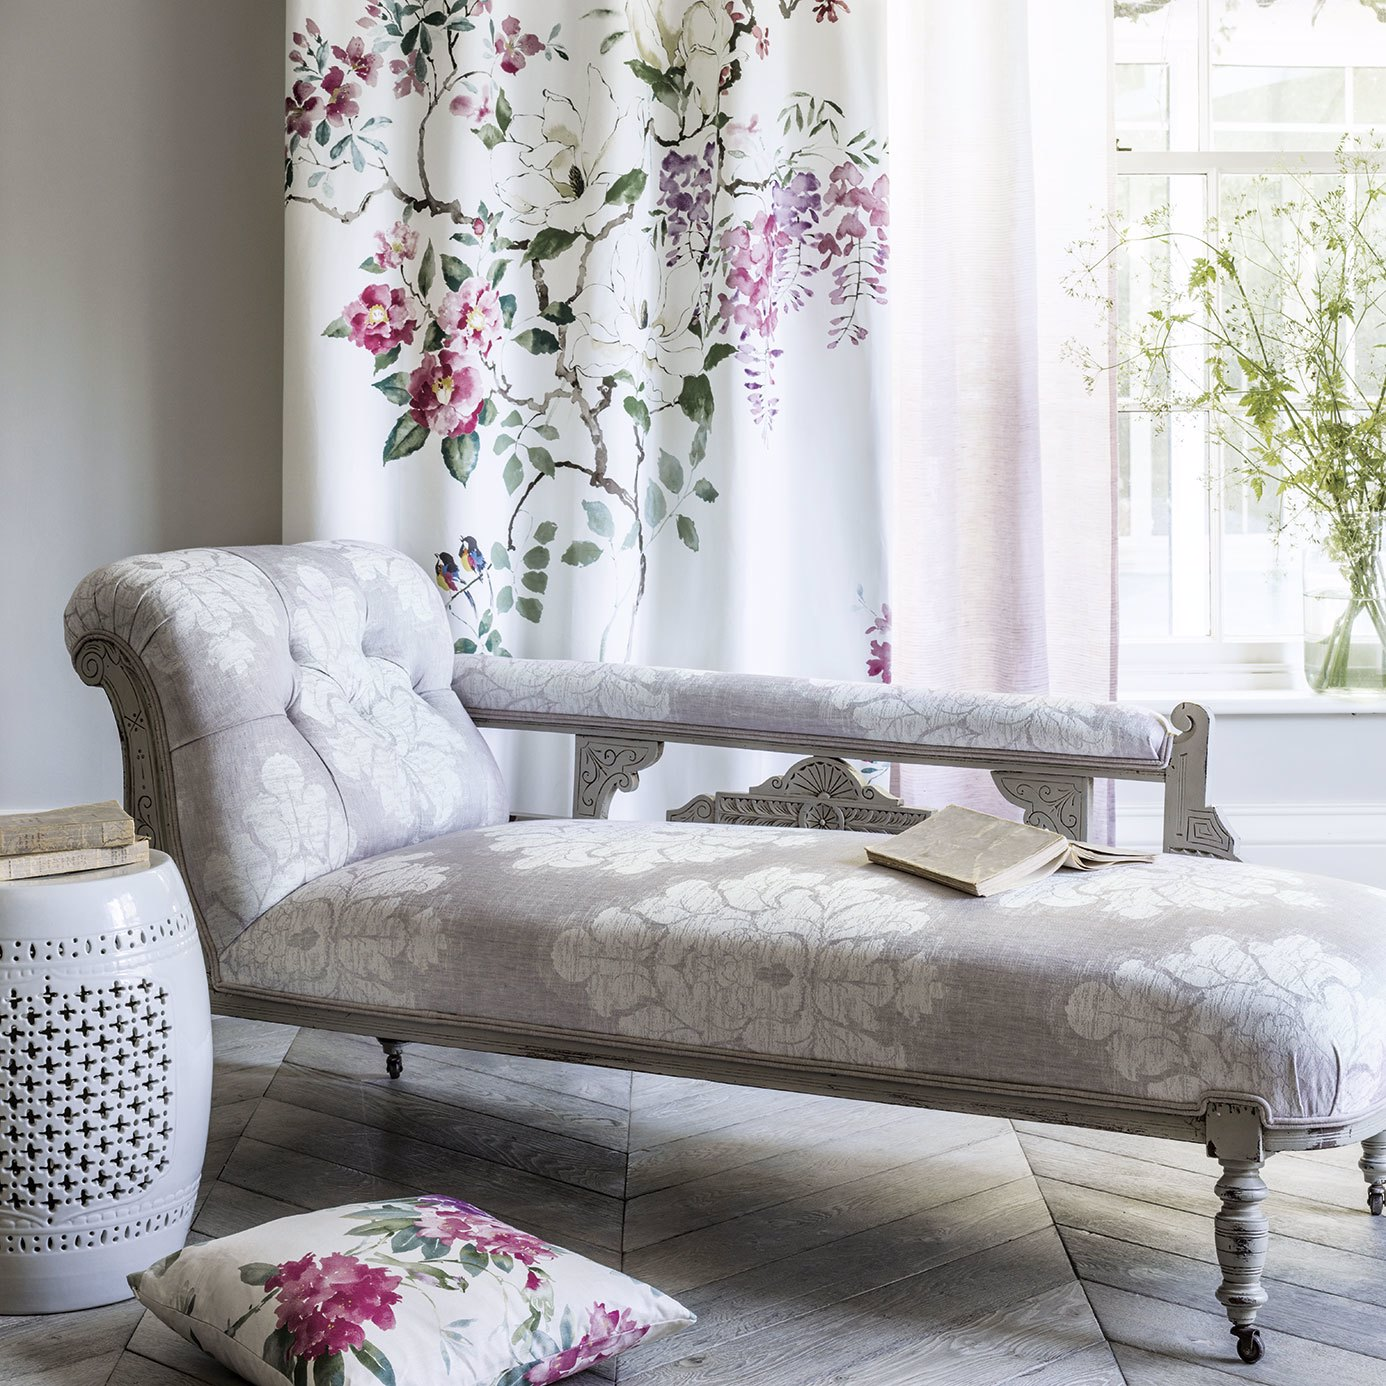 Magnolia & Blossom by SAN